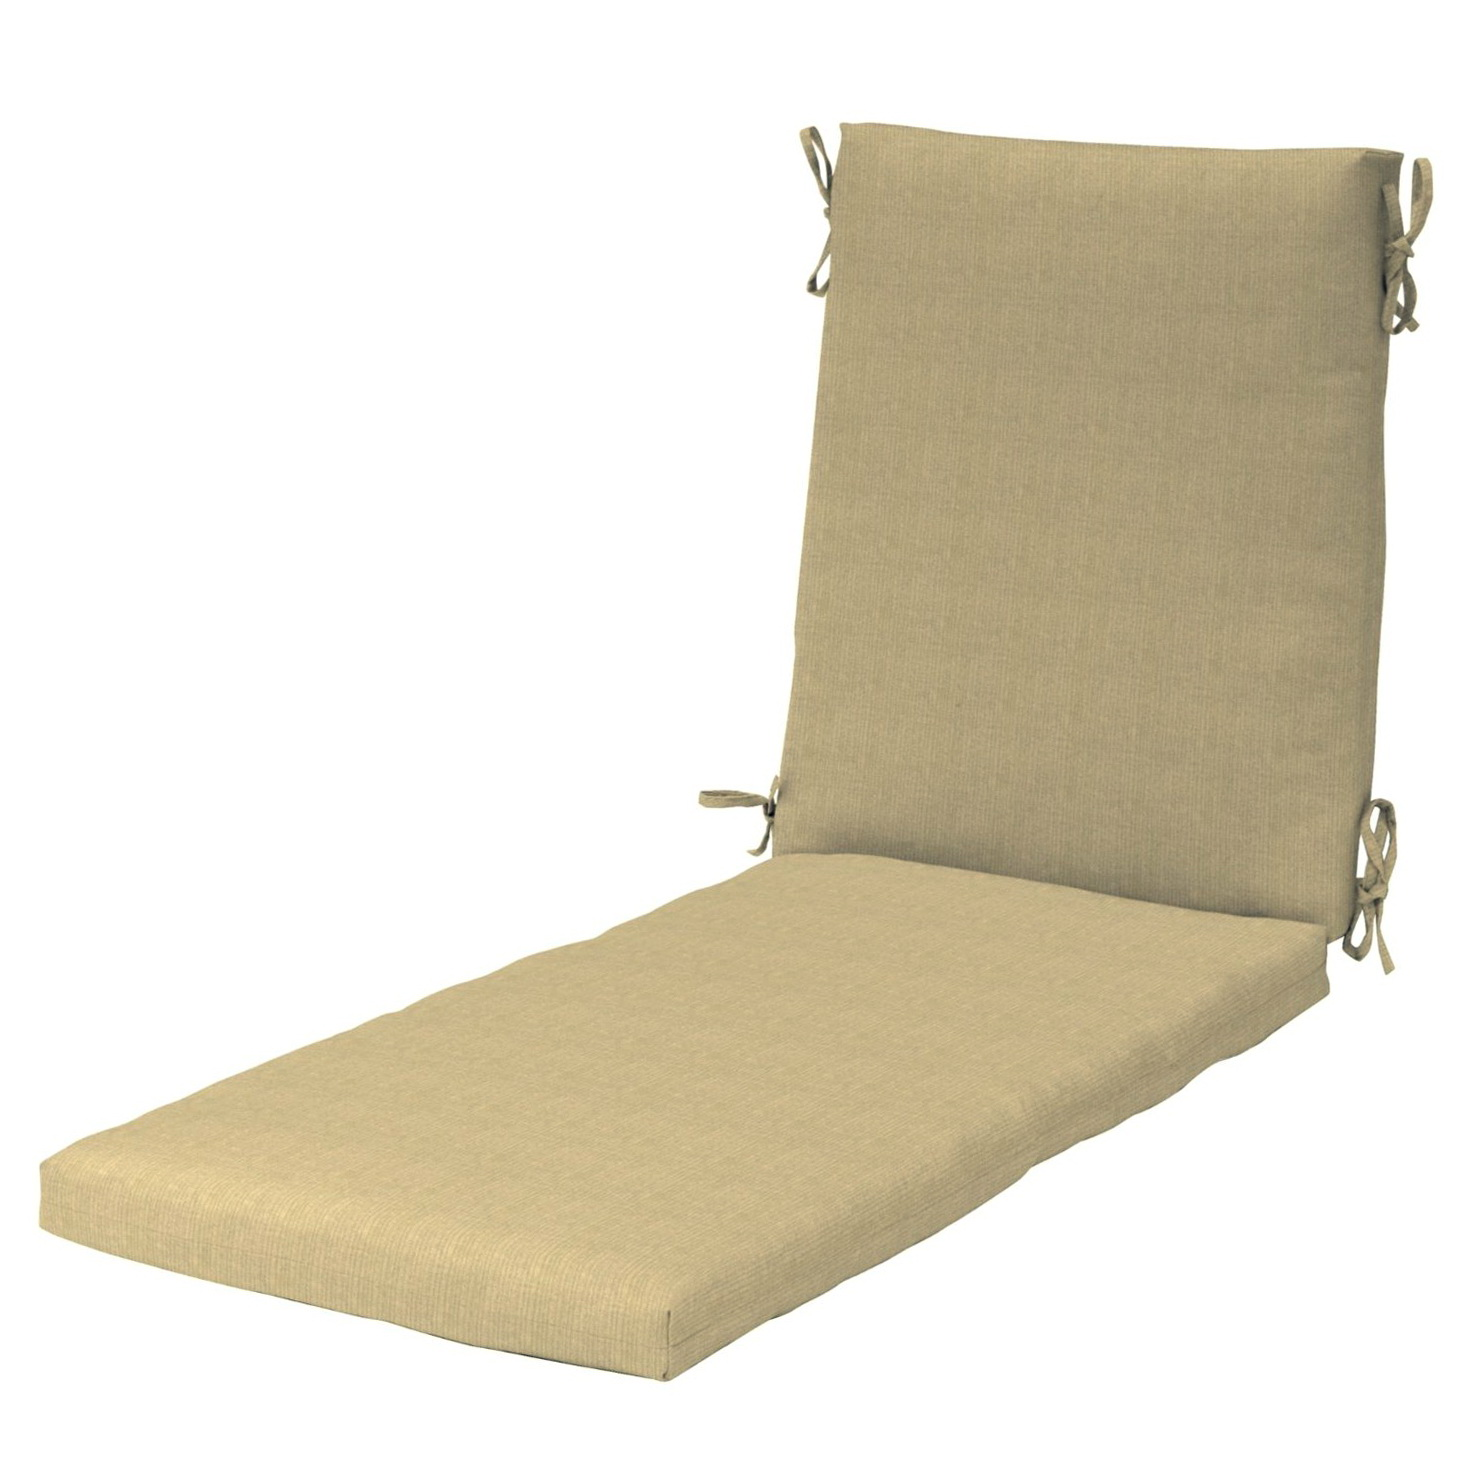 Patio Chair Cushions On Sale